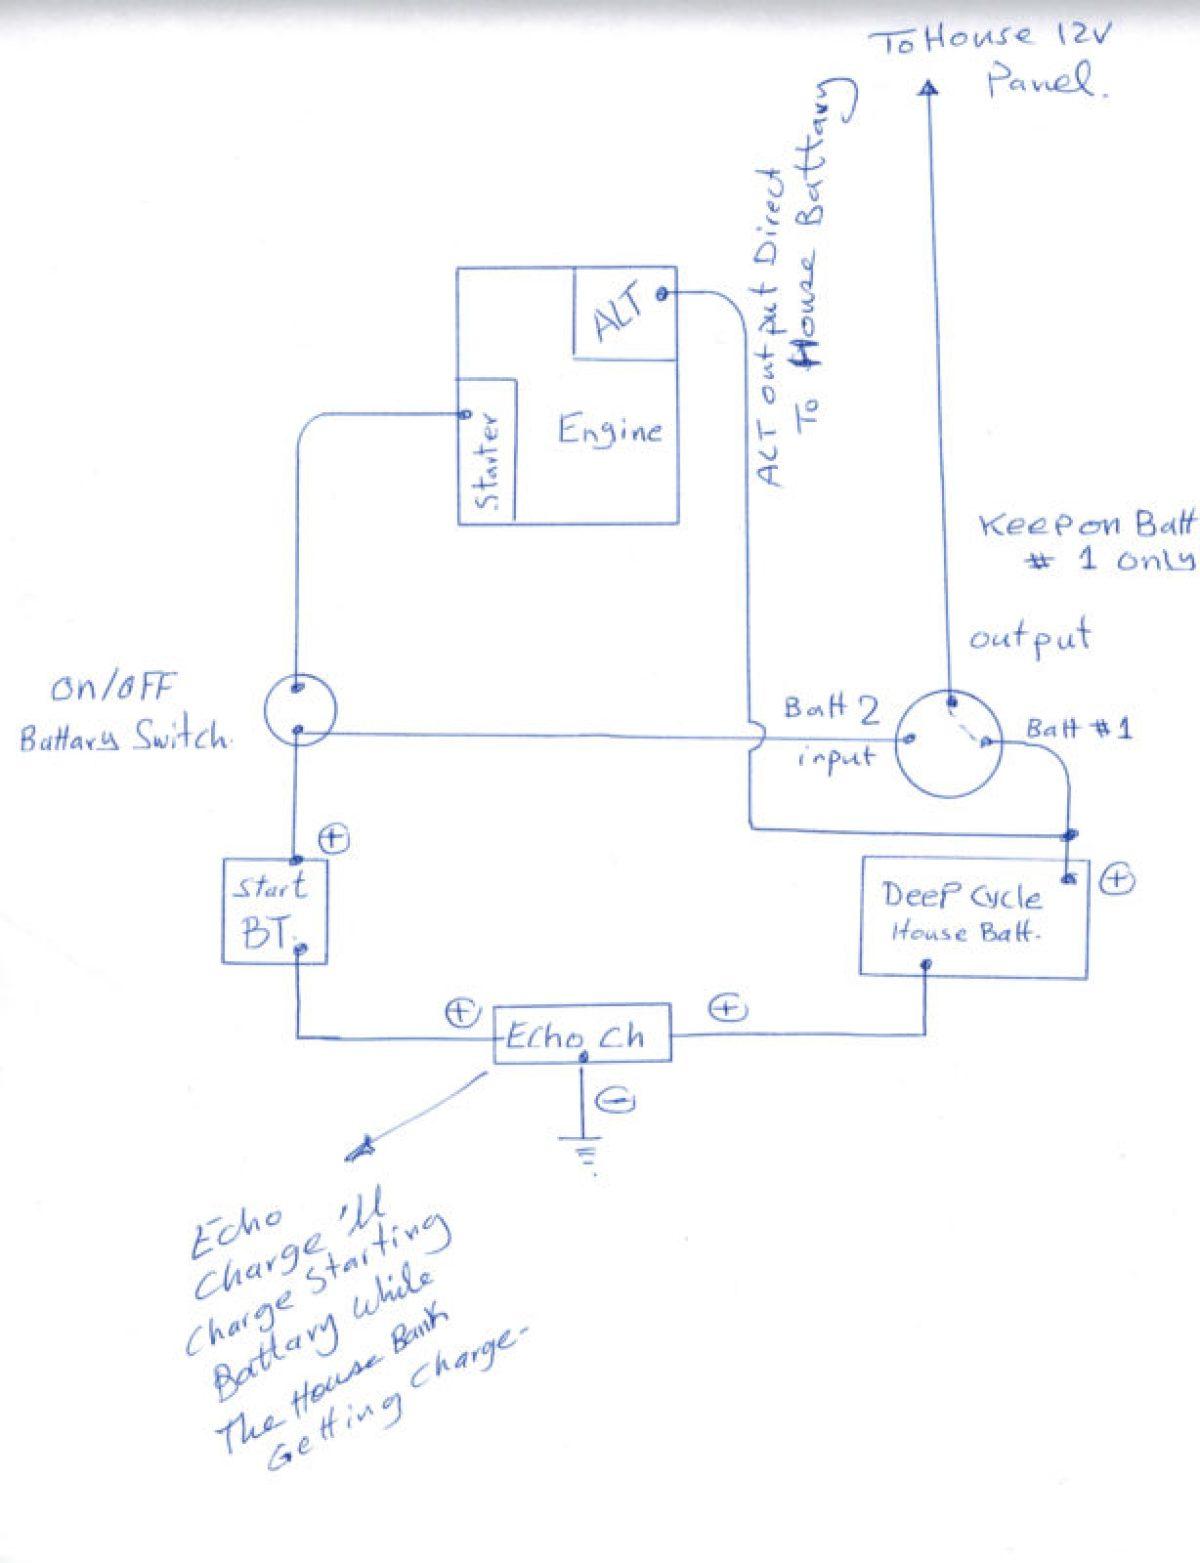 sailboat wiring diagram for xantrex echo-charge – ac dc marine inc.  ac dc marine inc.